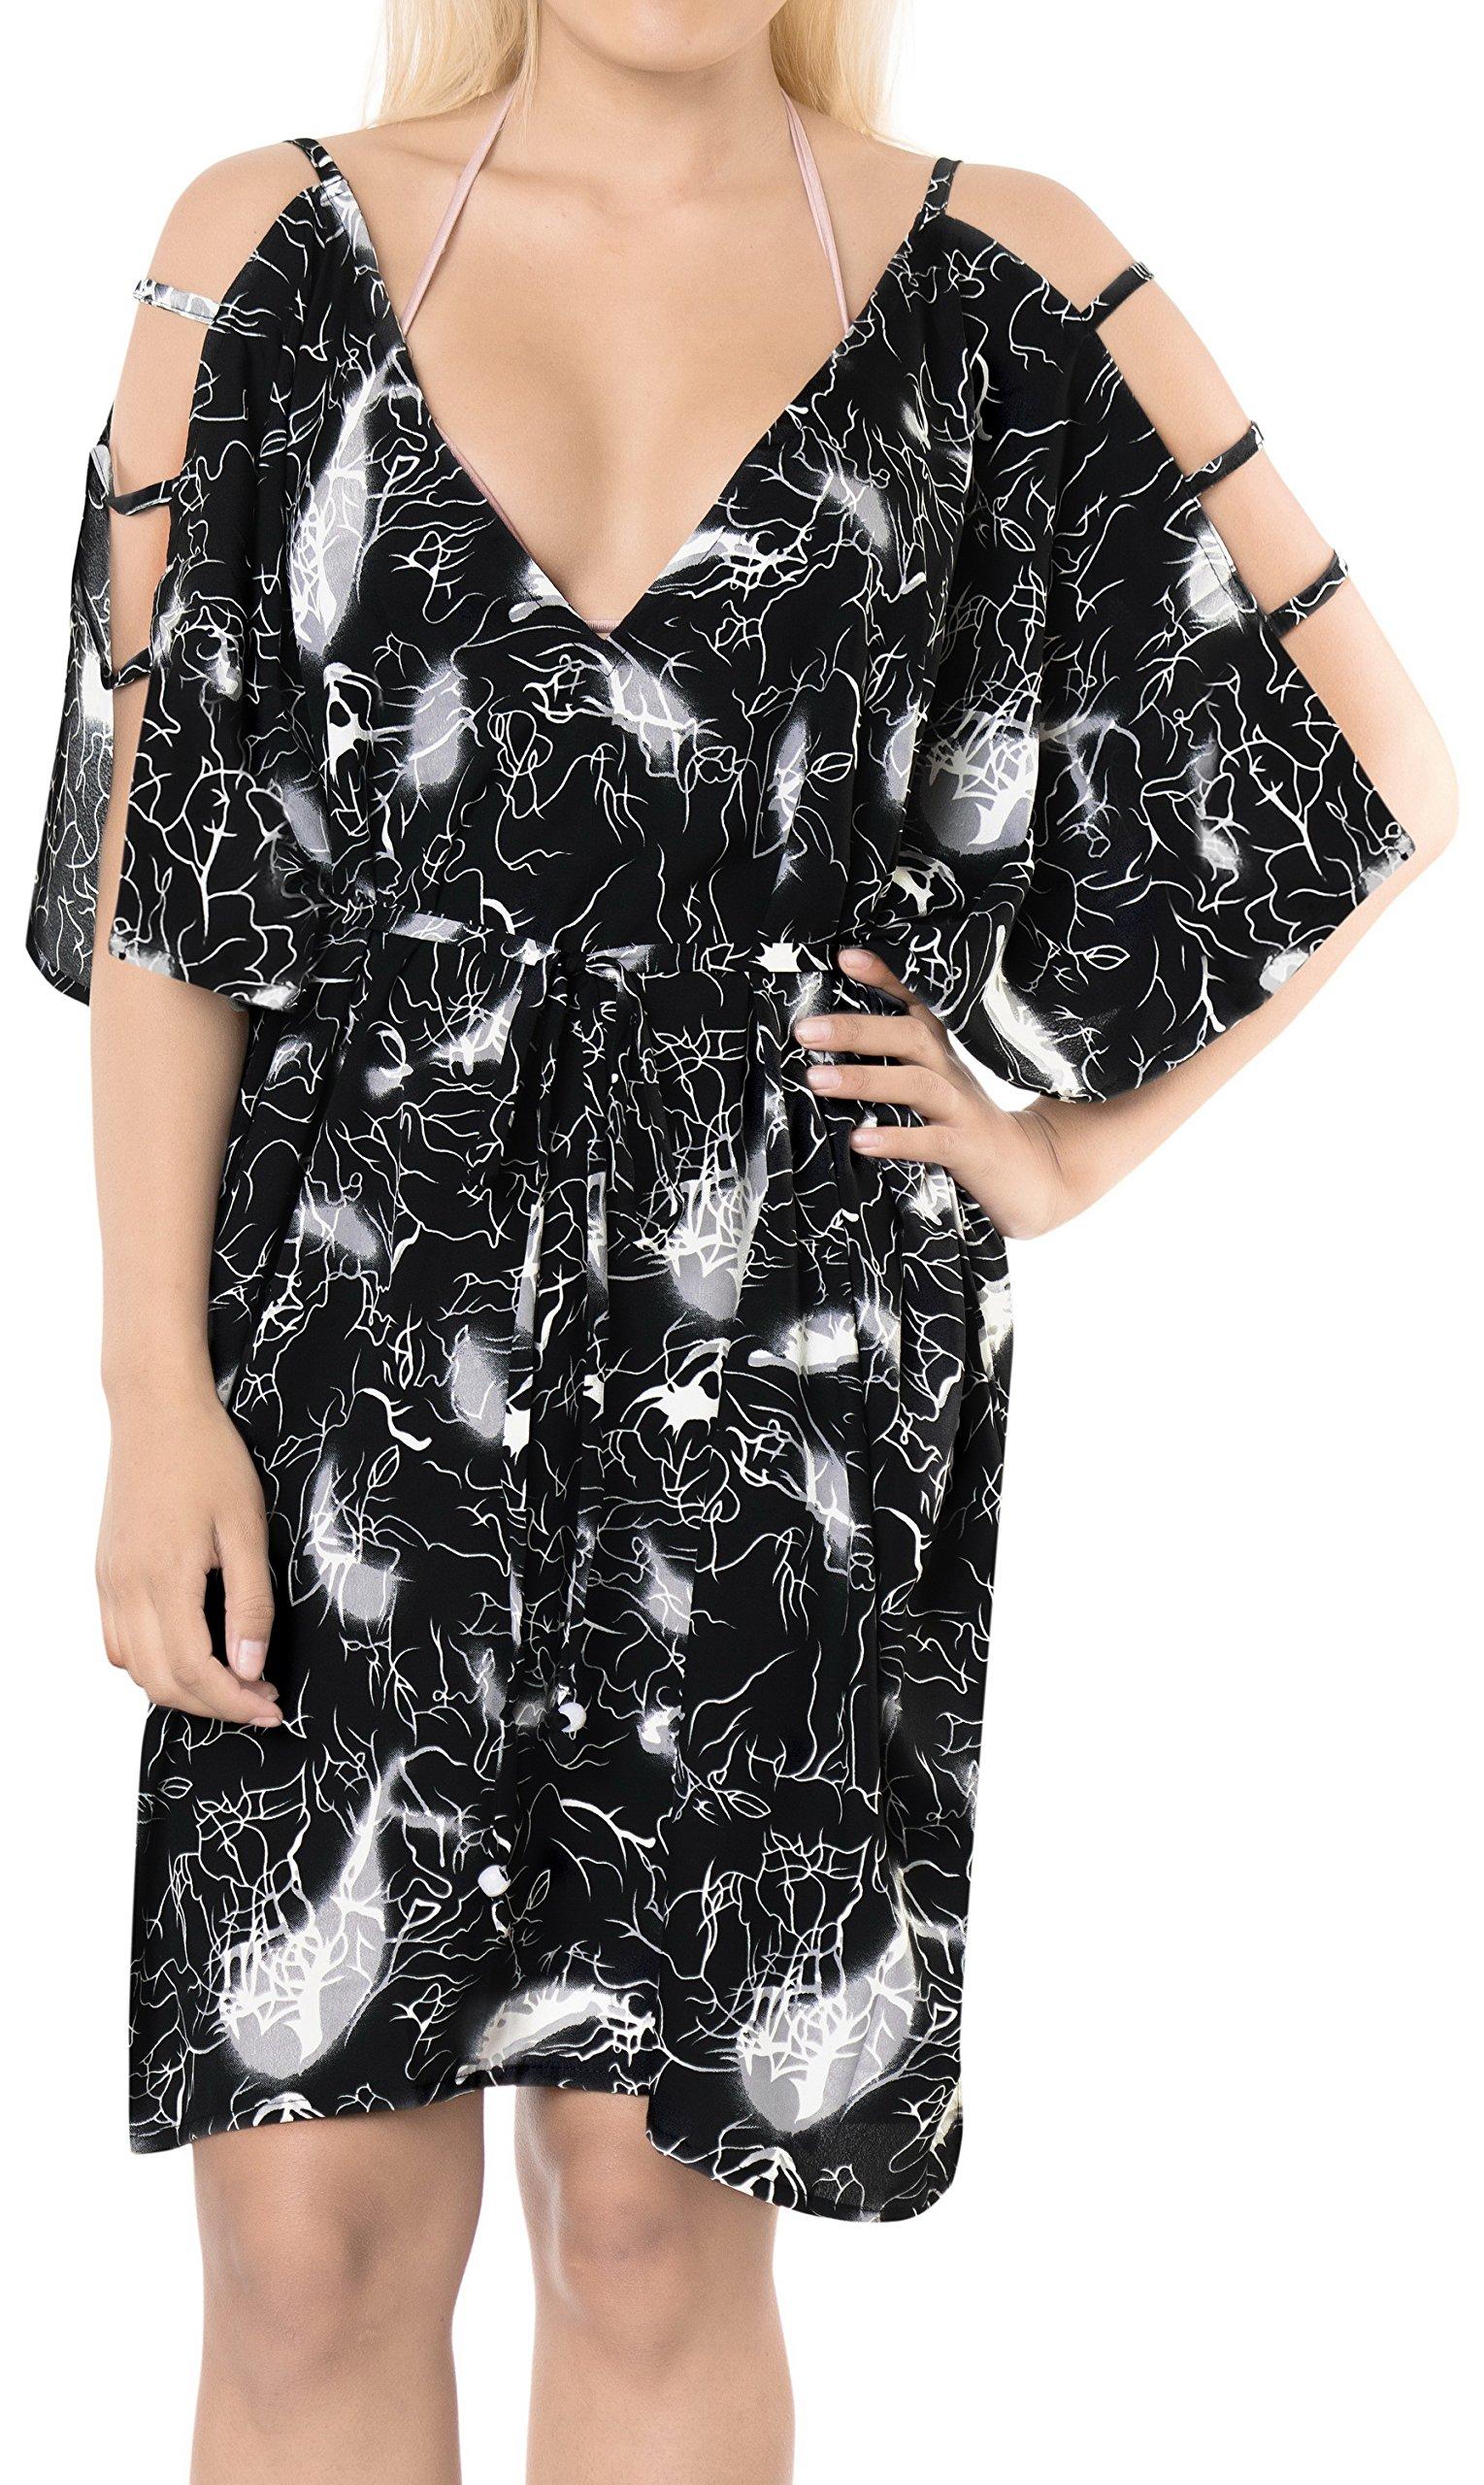 LA LEELA Soft fabric Printed Swimsuit Cover Up OSFM 16-20 [XL-2X] Black_6609